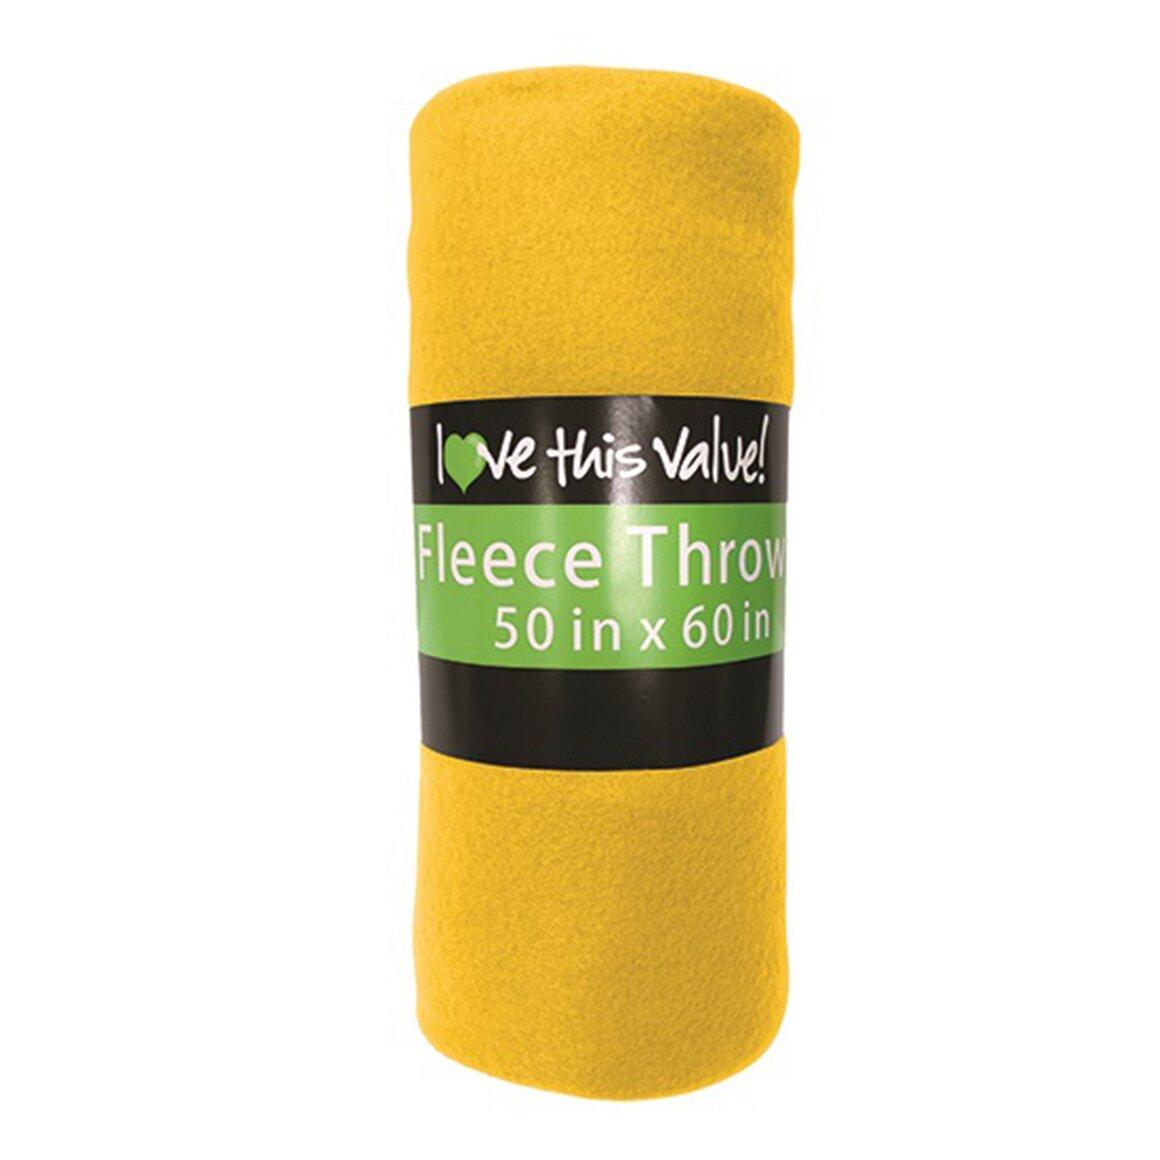 Imperial Home Decor Group Wallpaper Imperial Home Soft Cozy Fleece Throw Blanket Reviews Wayfair